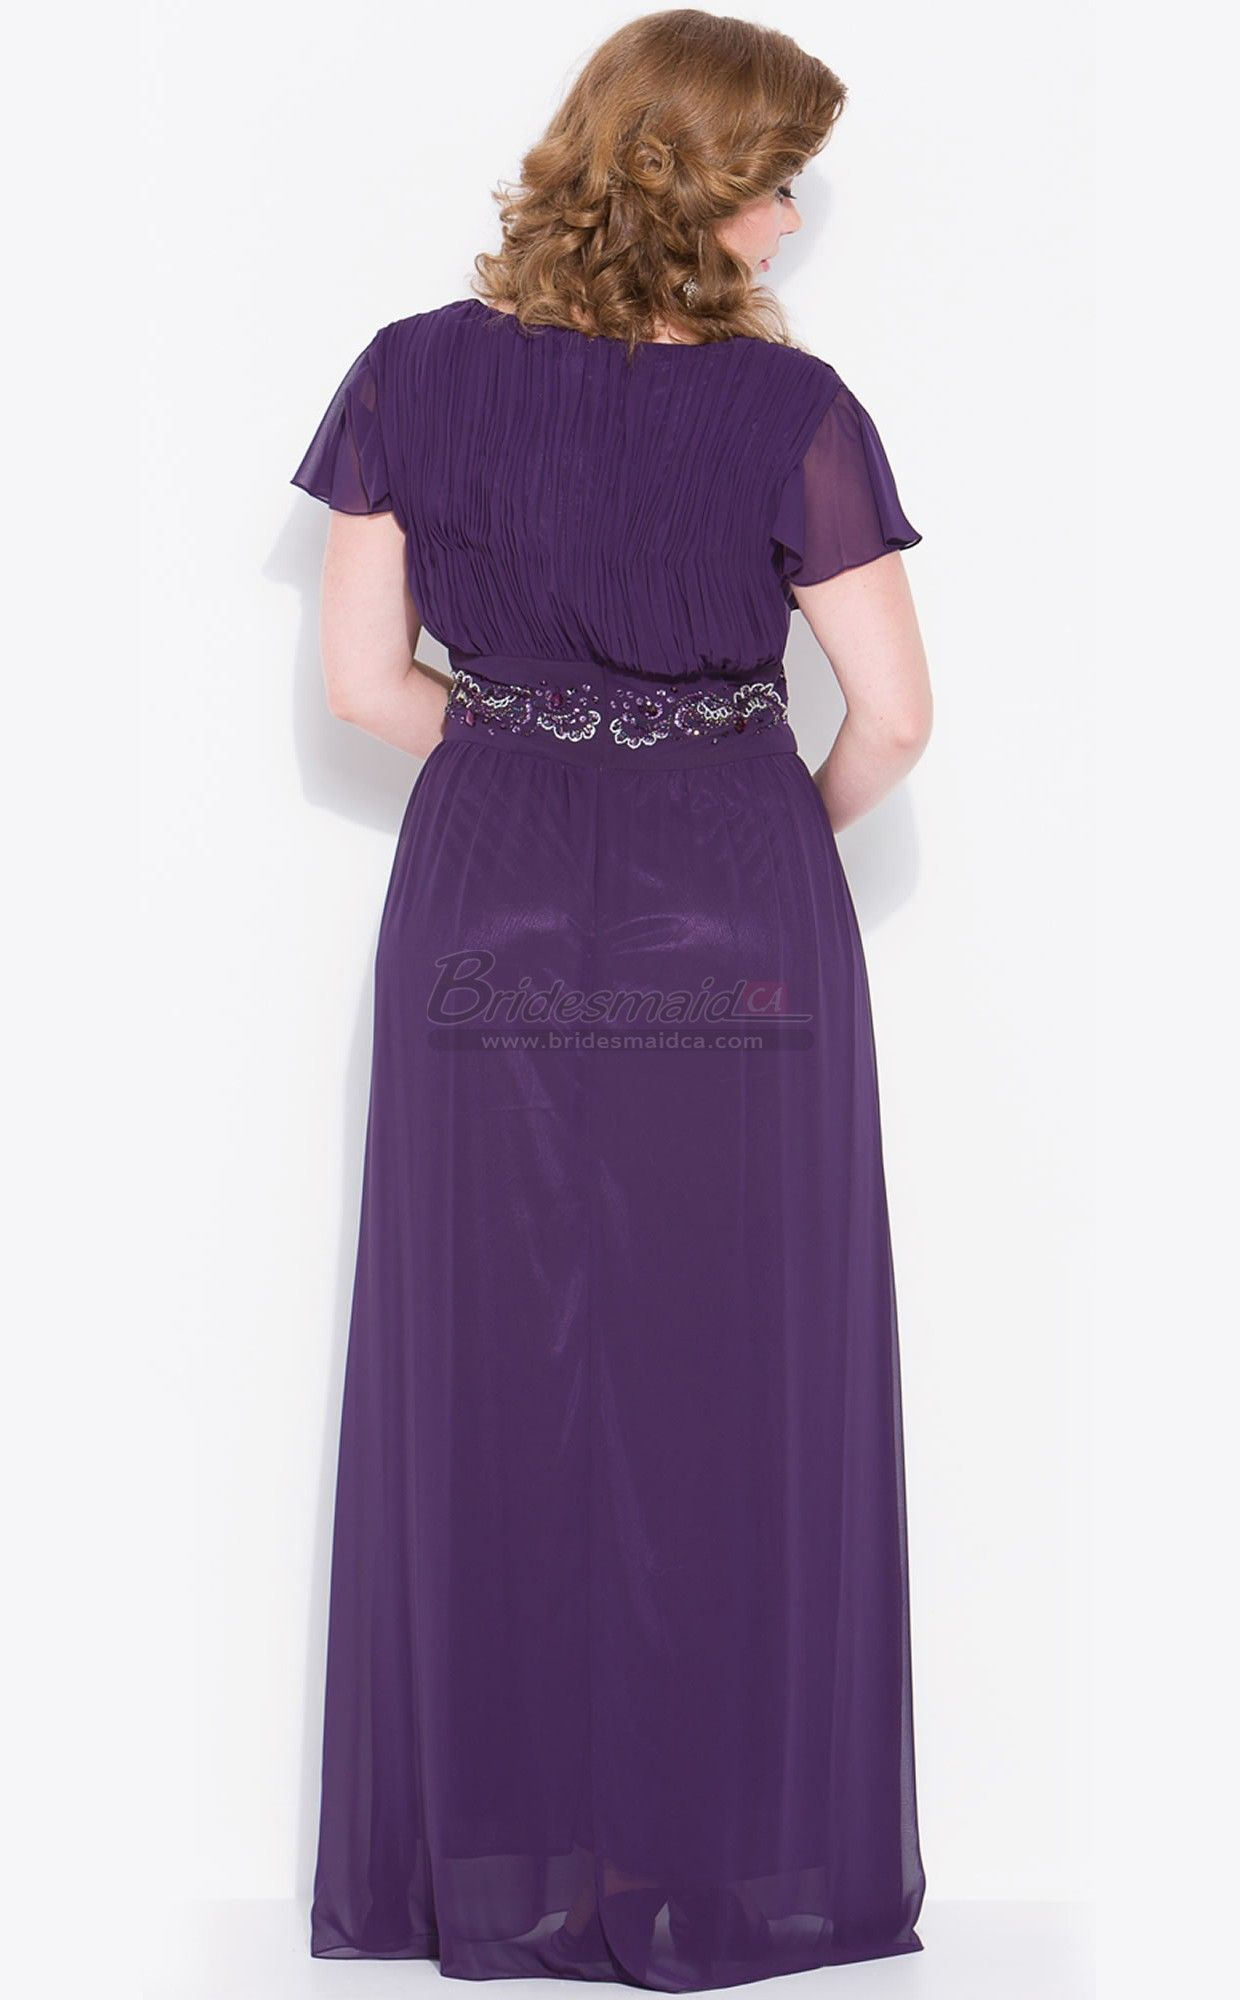 Vistoso Long Plus Size Bridesmaid Dresses Composición - Ideas de ...